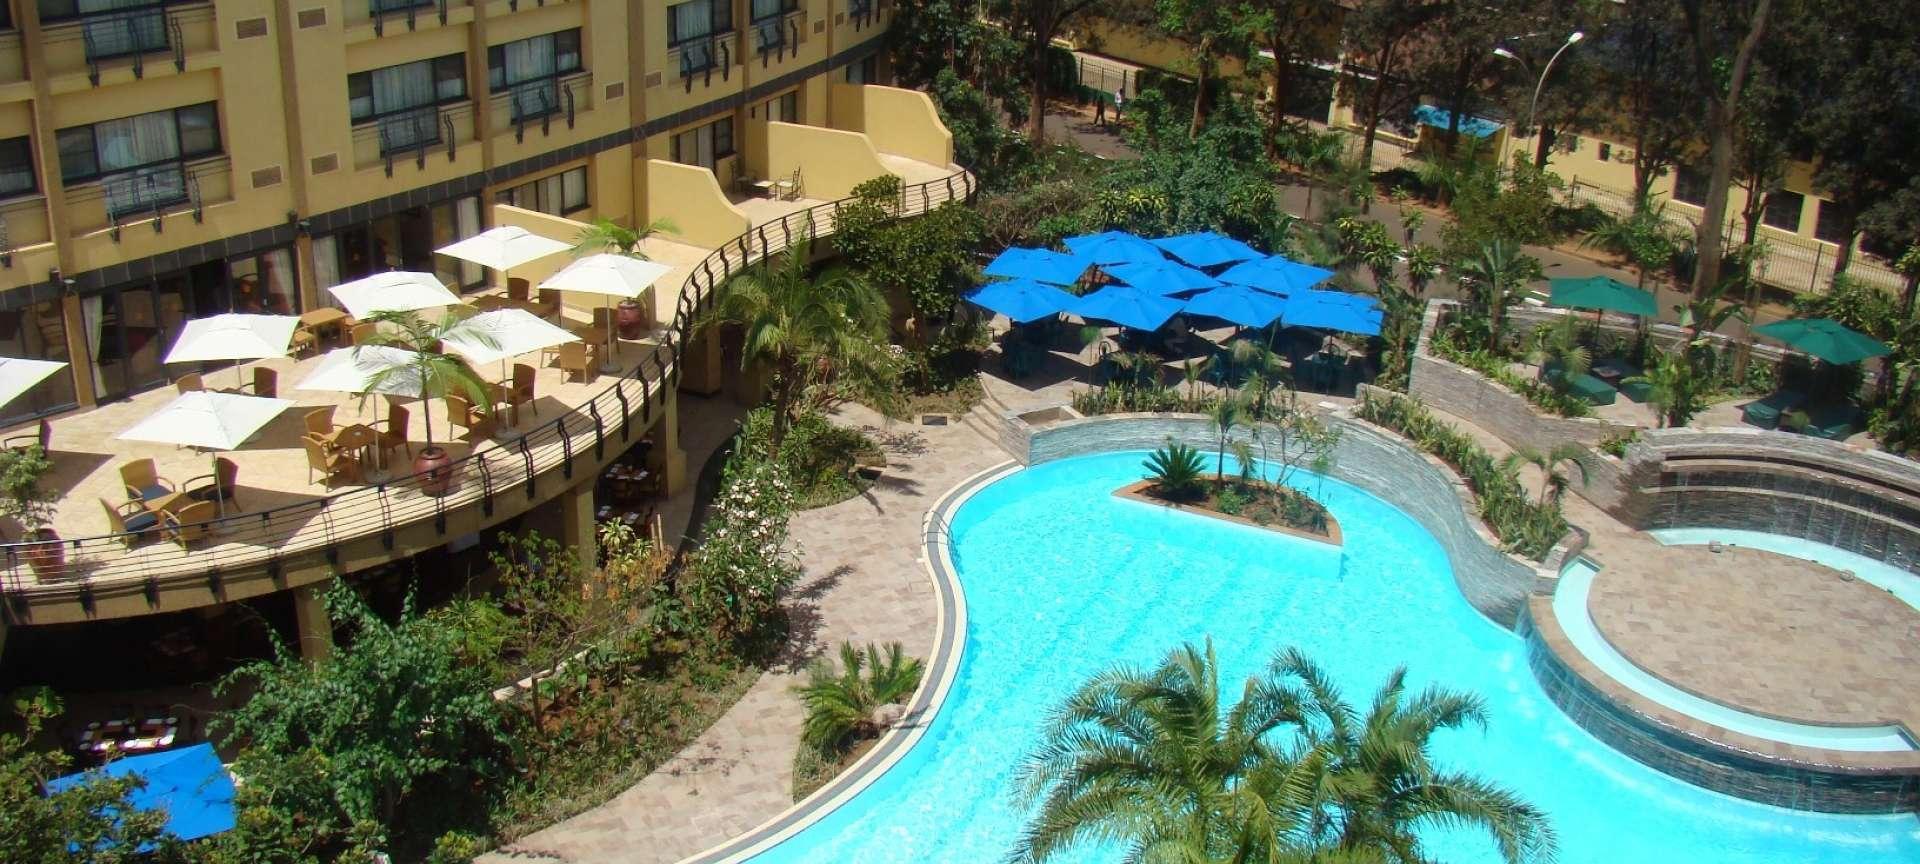 Kigali Serena Hotel Pool Area